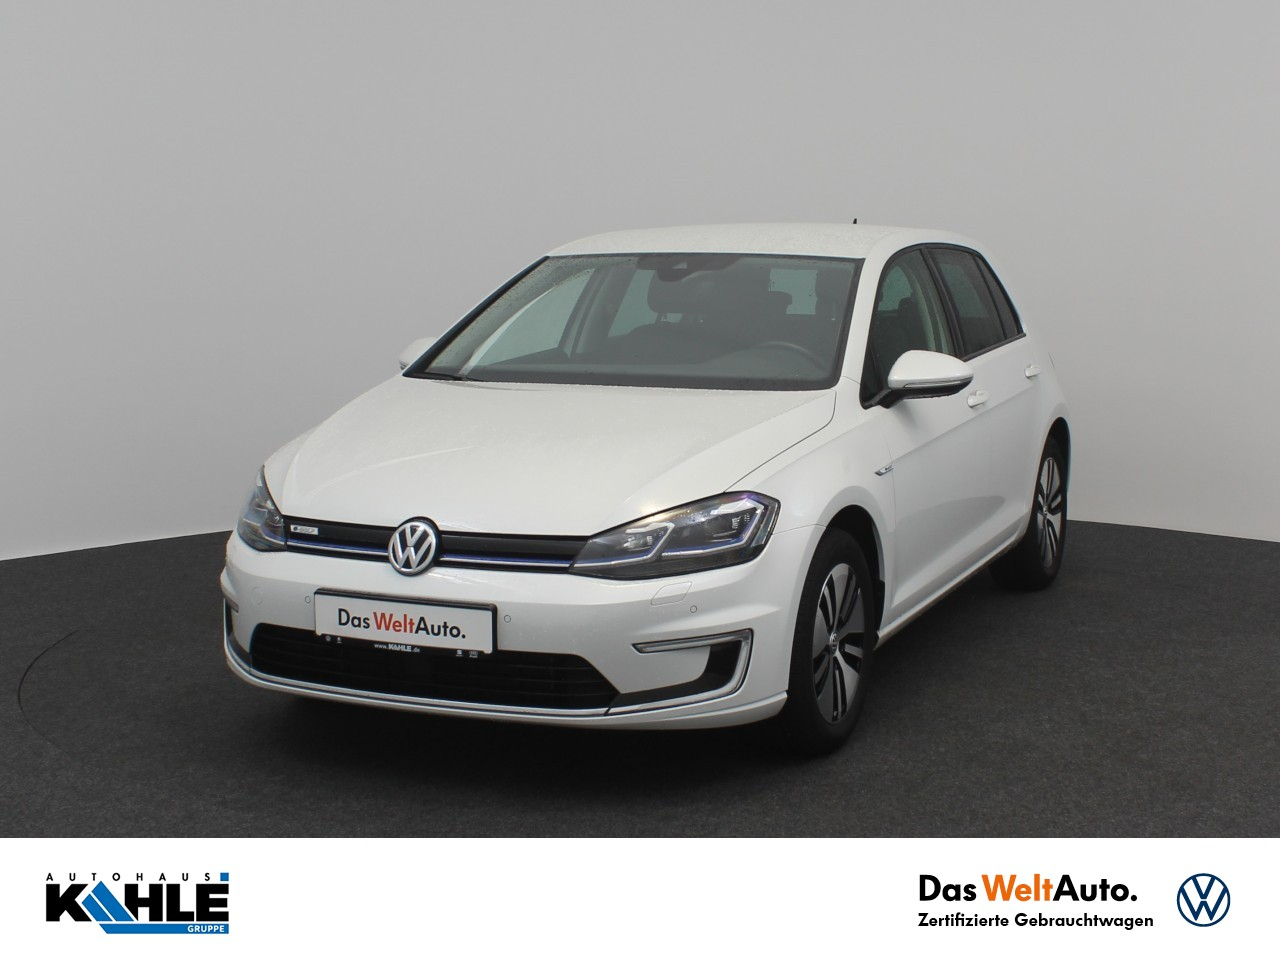 Volkswagen Golf VII e-Golf Navi LED Klima SItzheizung, Jahr 2018, Elektro